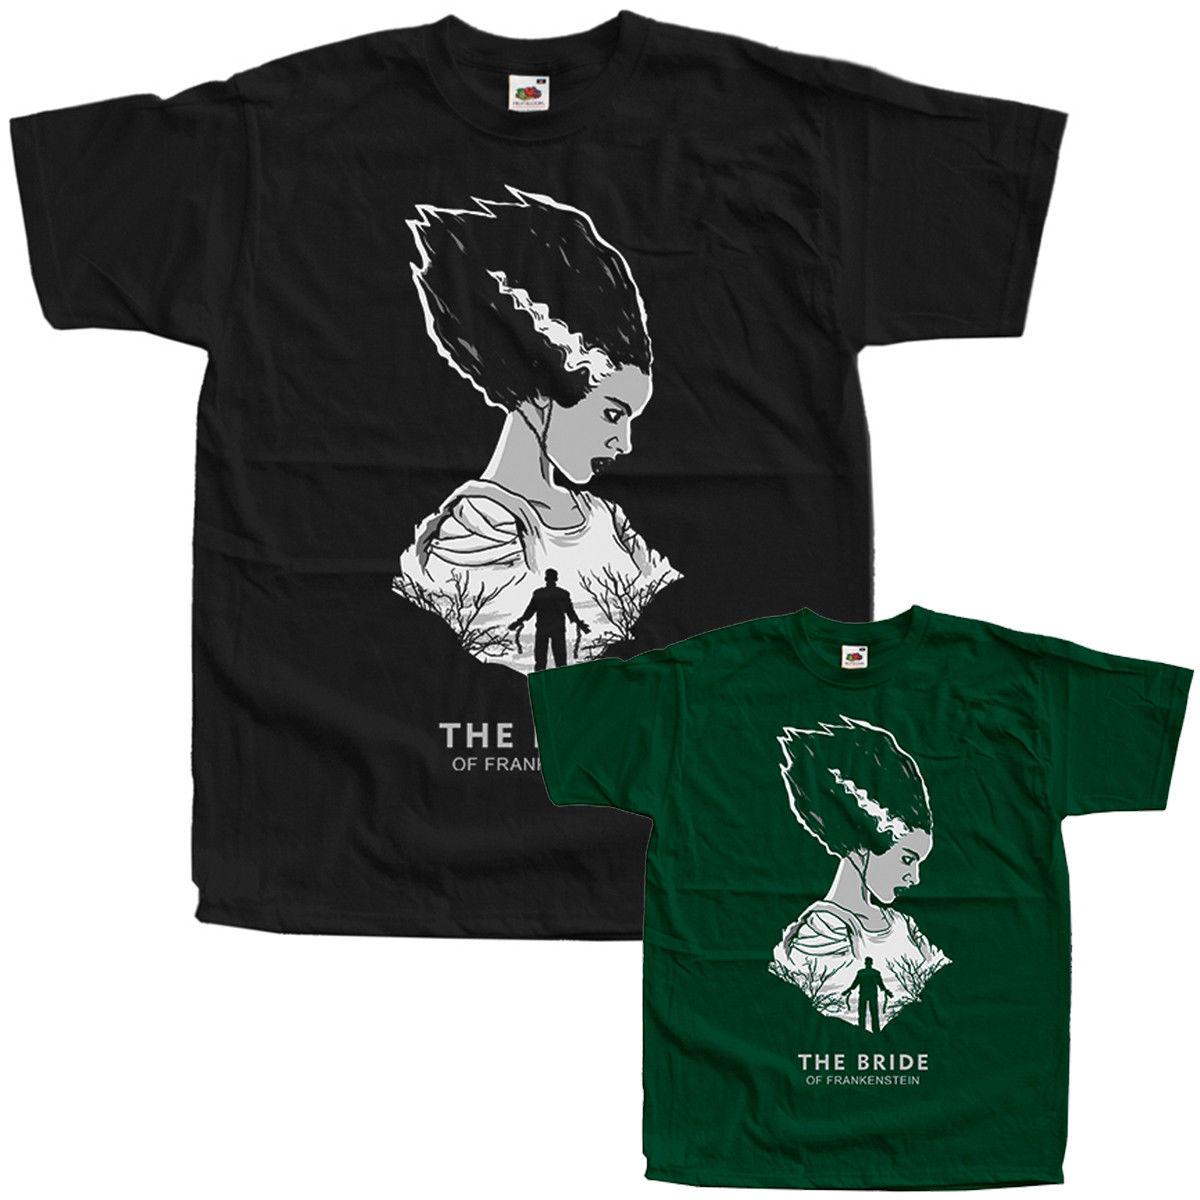 The Bride of Frankenstein ALL SIZES S-3XL movie poster, T-Shirt BLACK Cool xxxtentacion tshirt LGBT streetwear